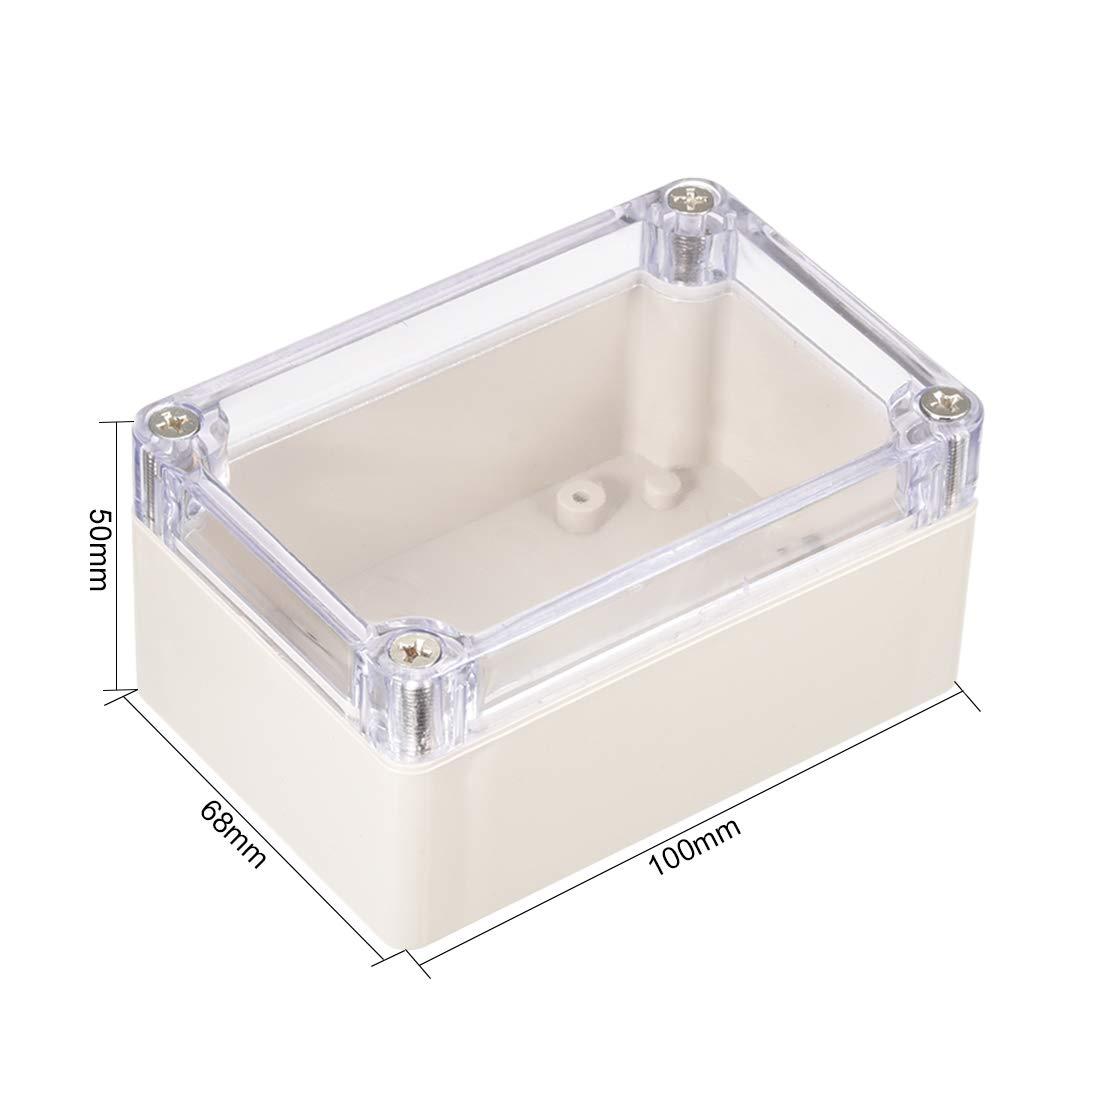 uxcell 3.9 inches x 2.7 inches x 2 inches 100mm x 68mm x 50mm ABS Junction Box Universal Project Enclosure w PC Transparent Cover